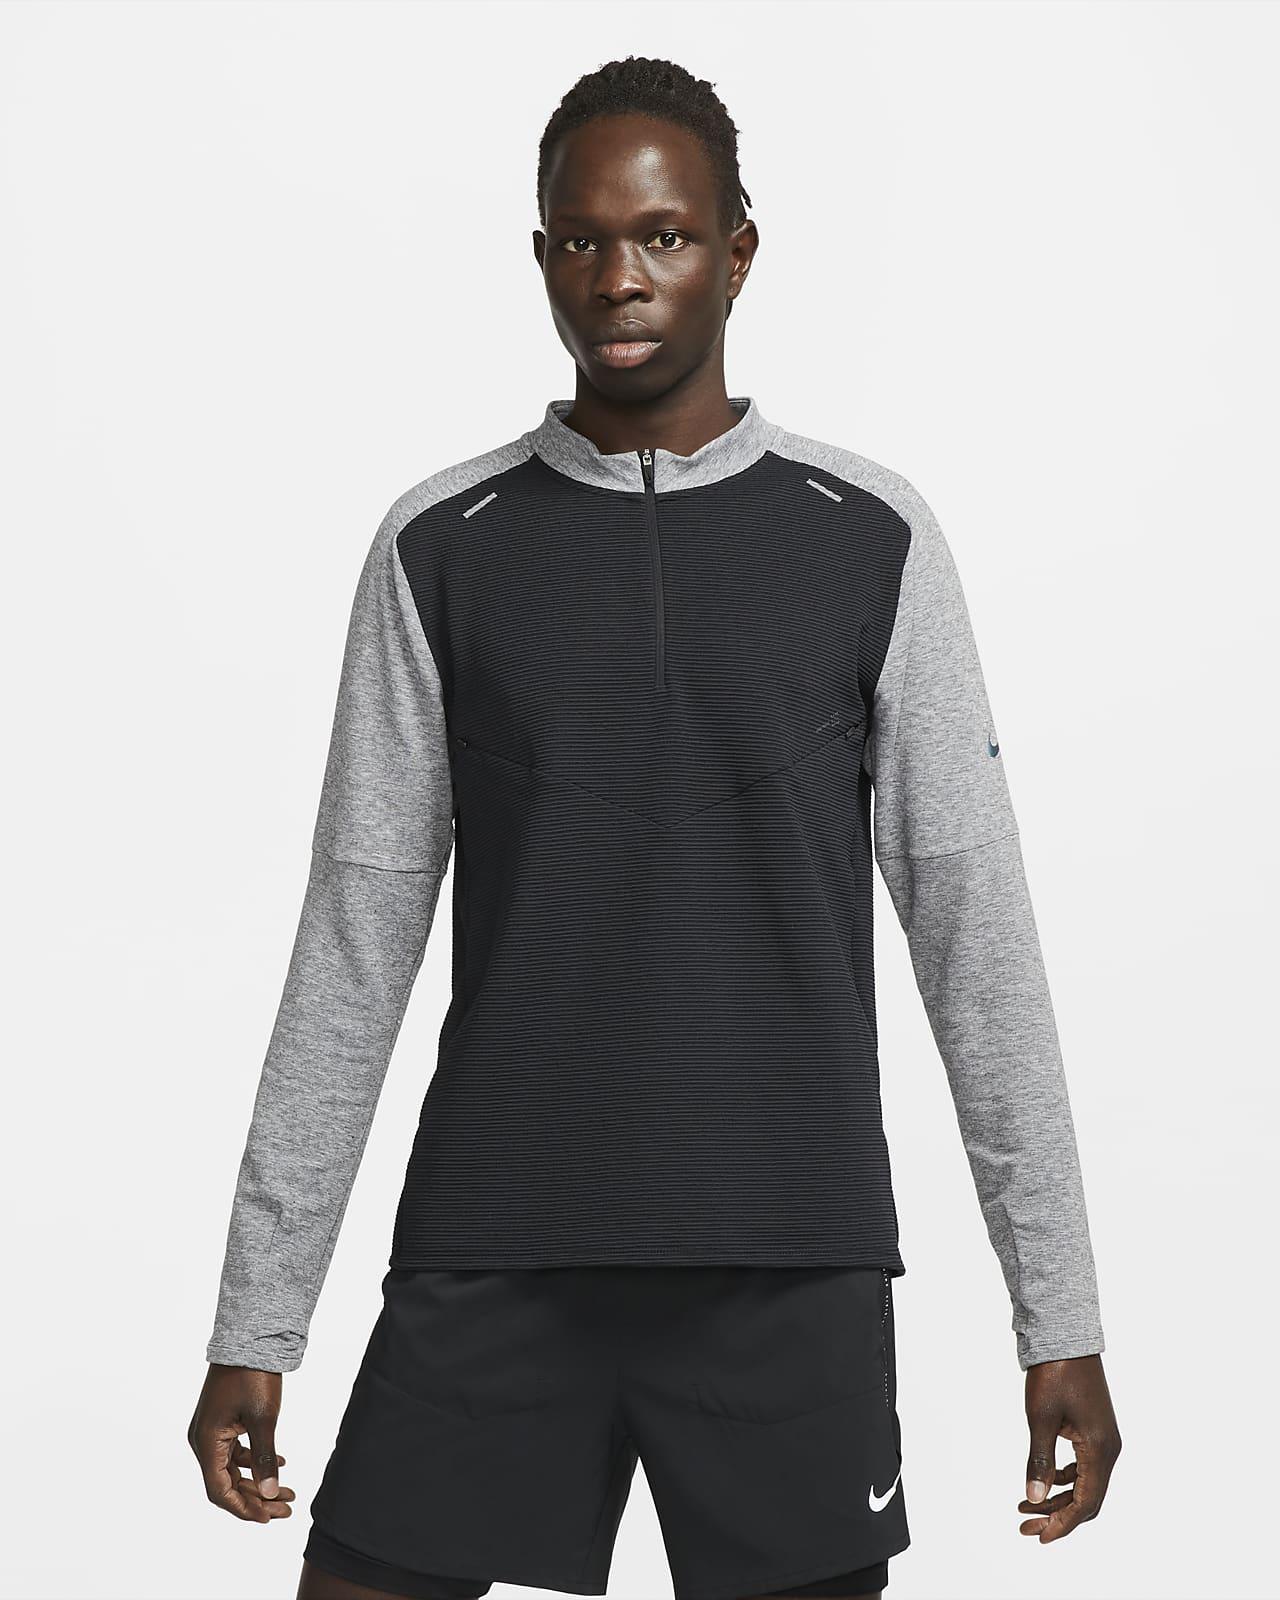 Capa media de running para hombre Nike Pinnacle Run Division